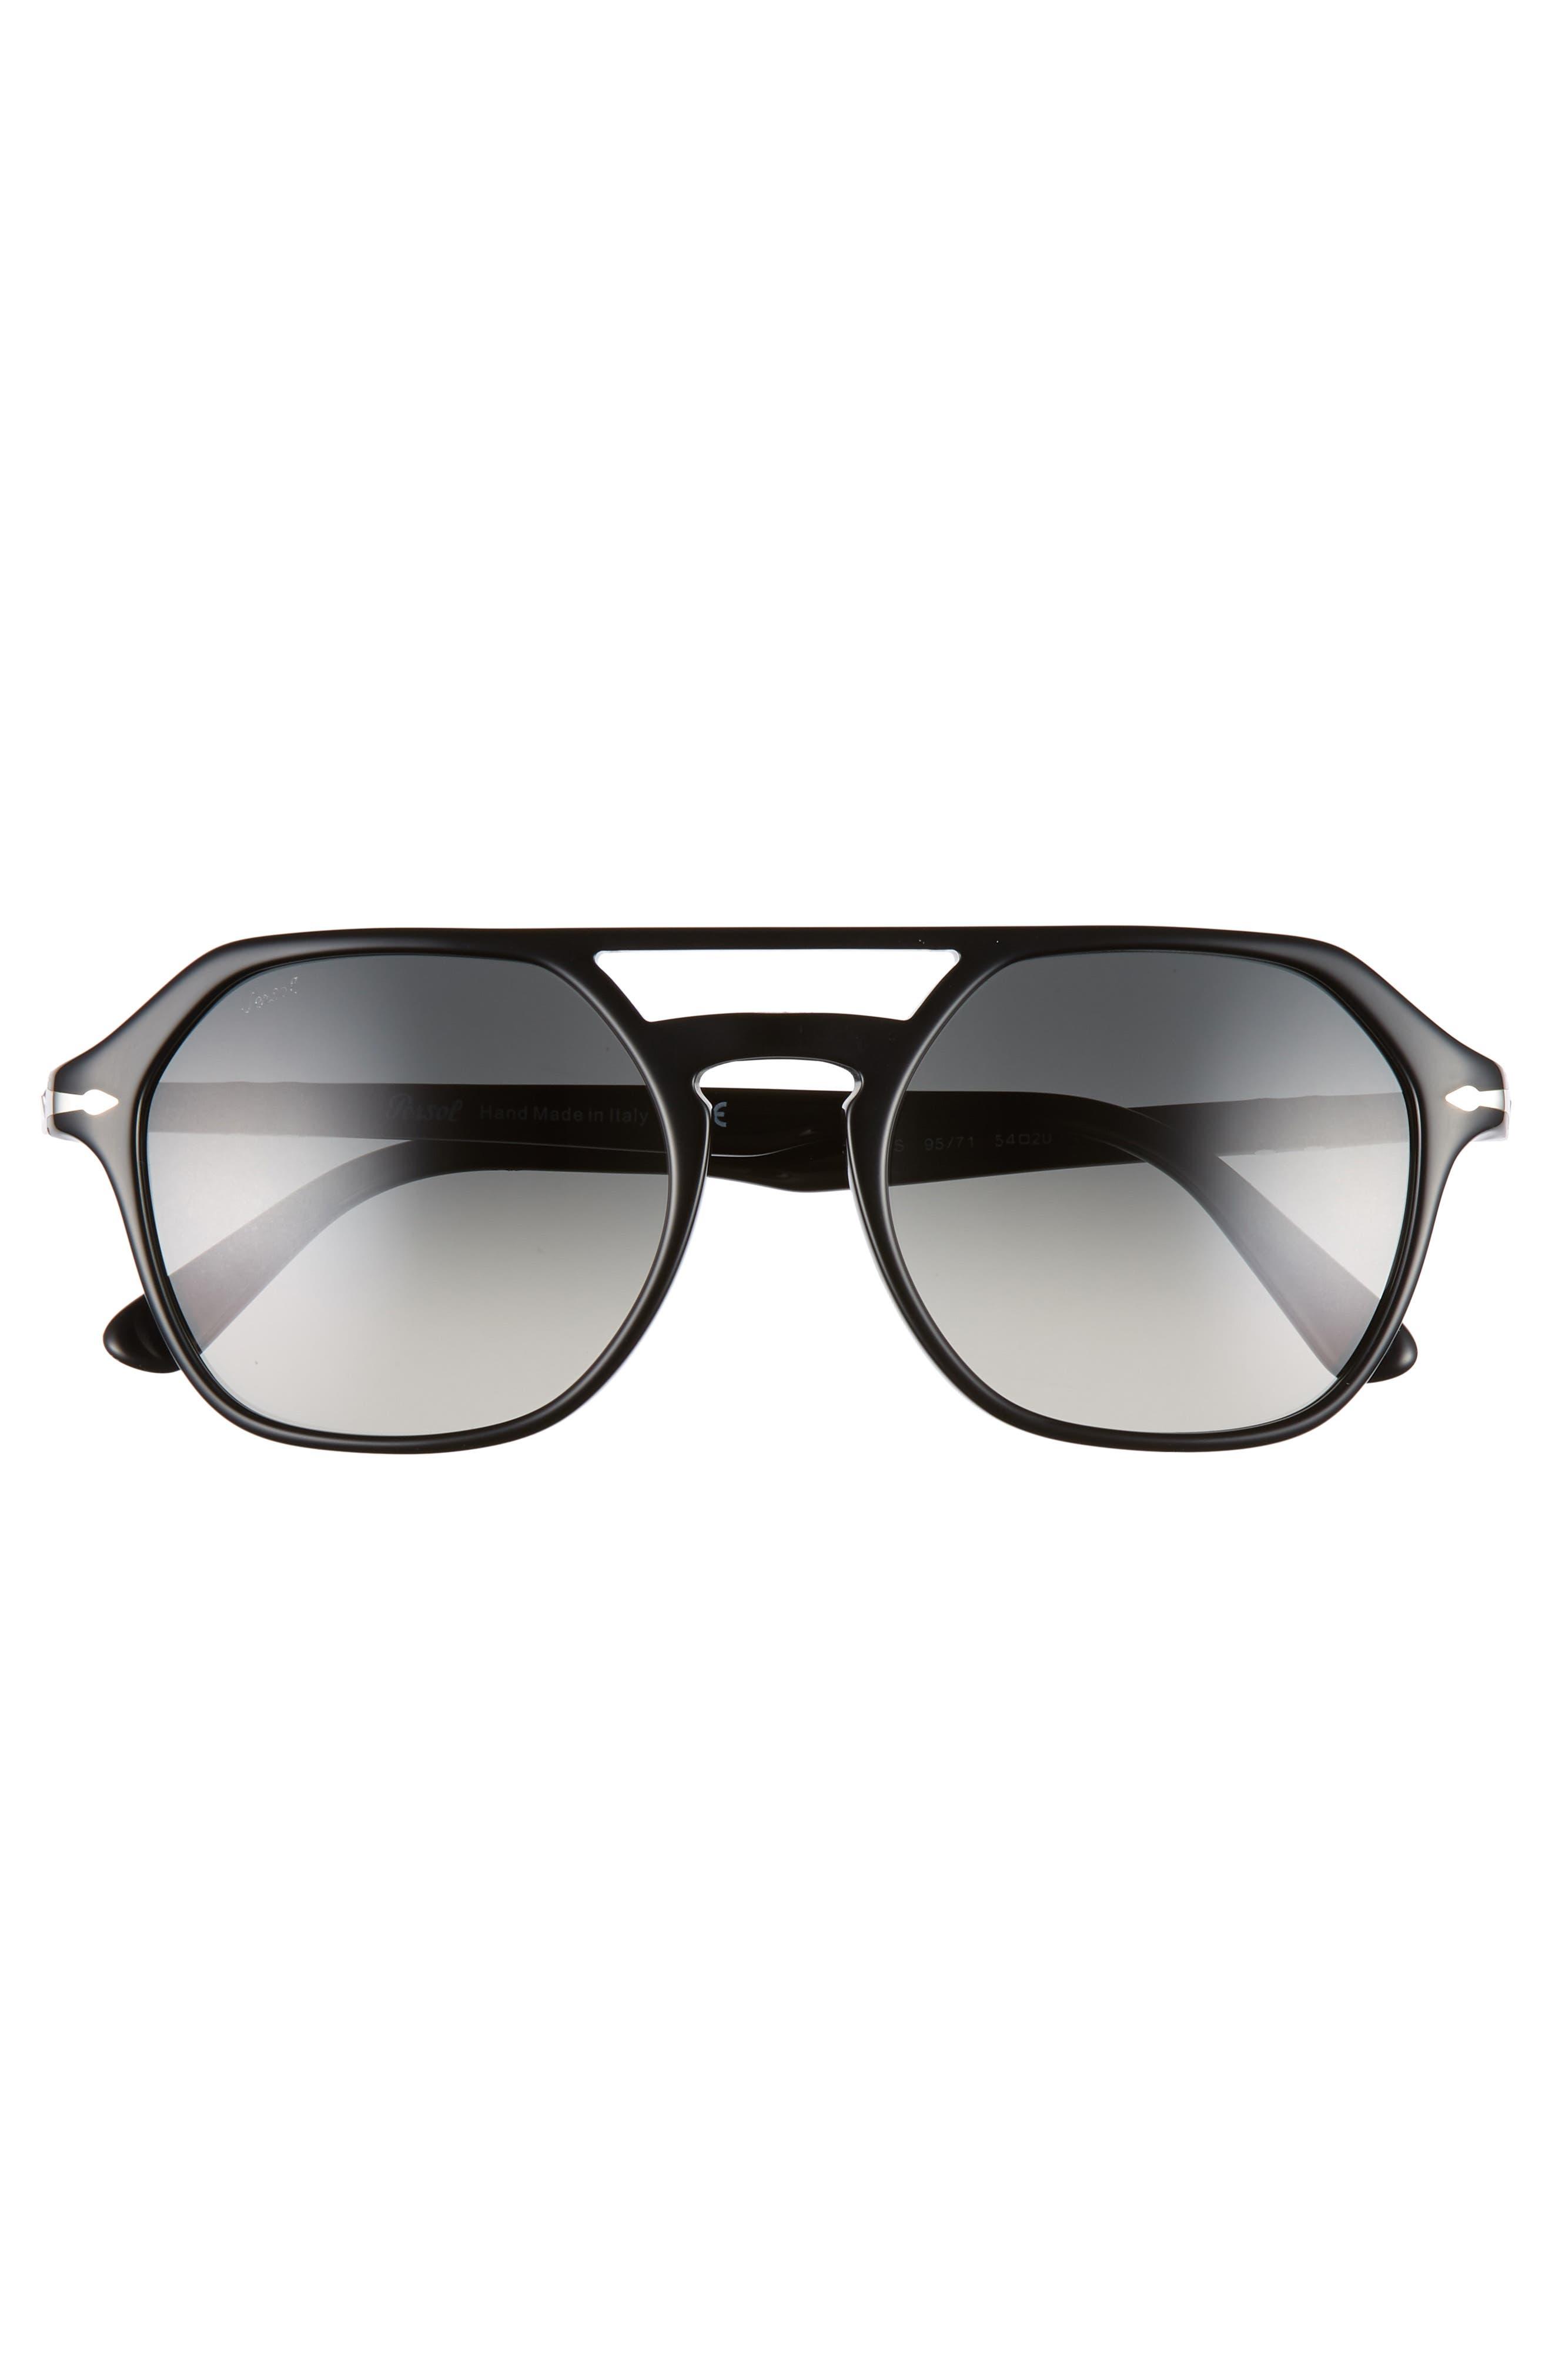 PERSOL,                             54mm Navigator Sunglasses,                             Alternate thumbnail 3, color,                             BLACK/ GREY GRADIENT